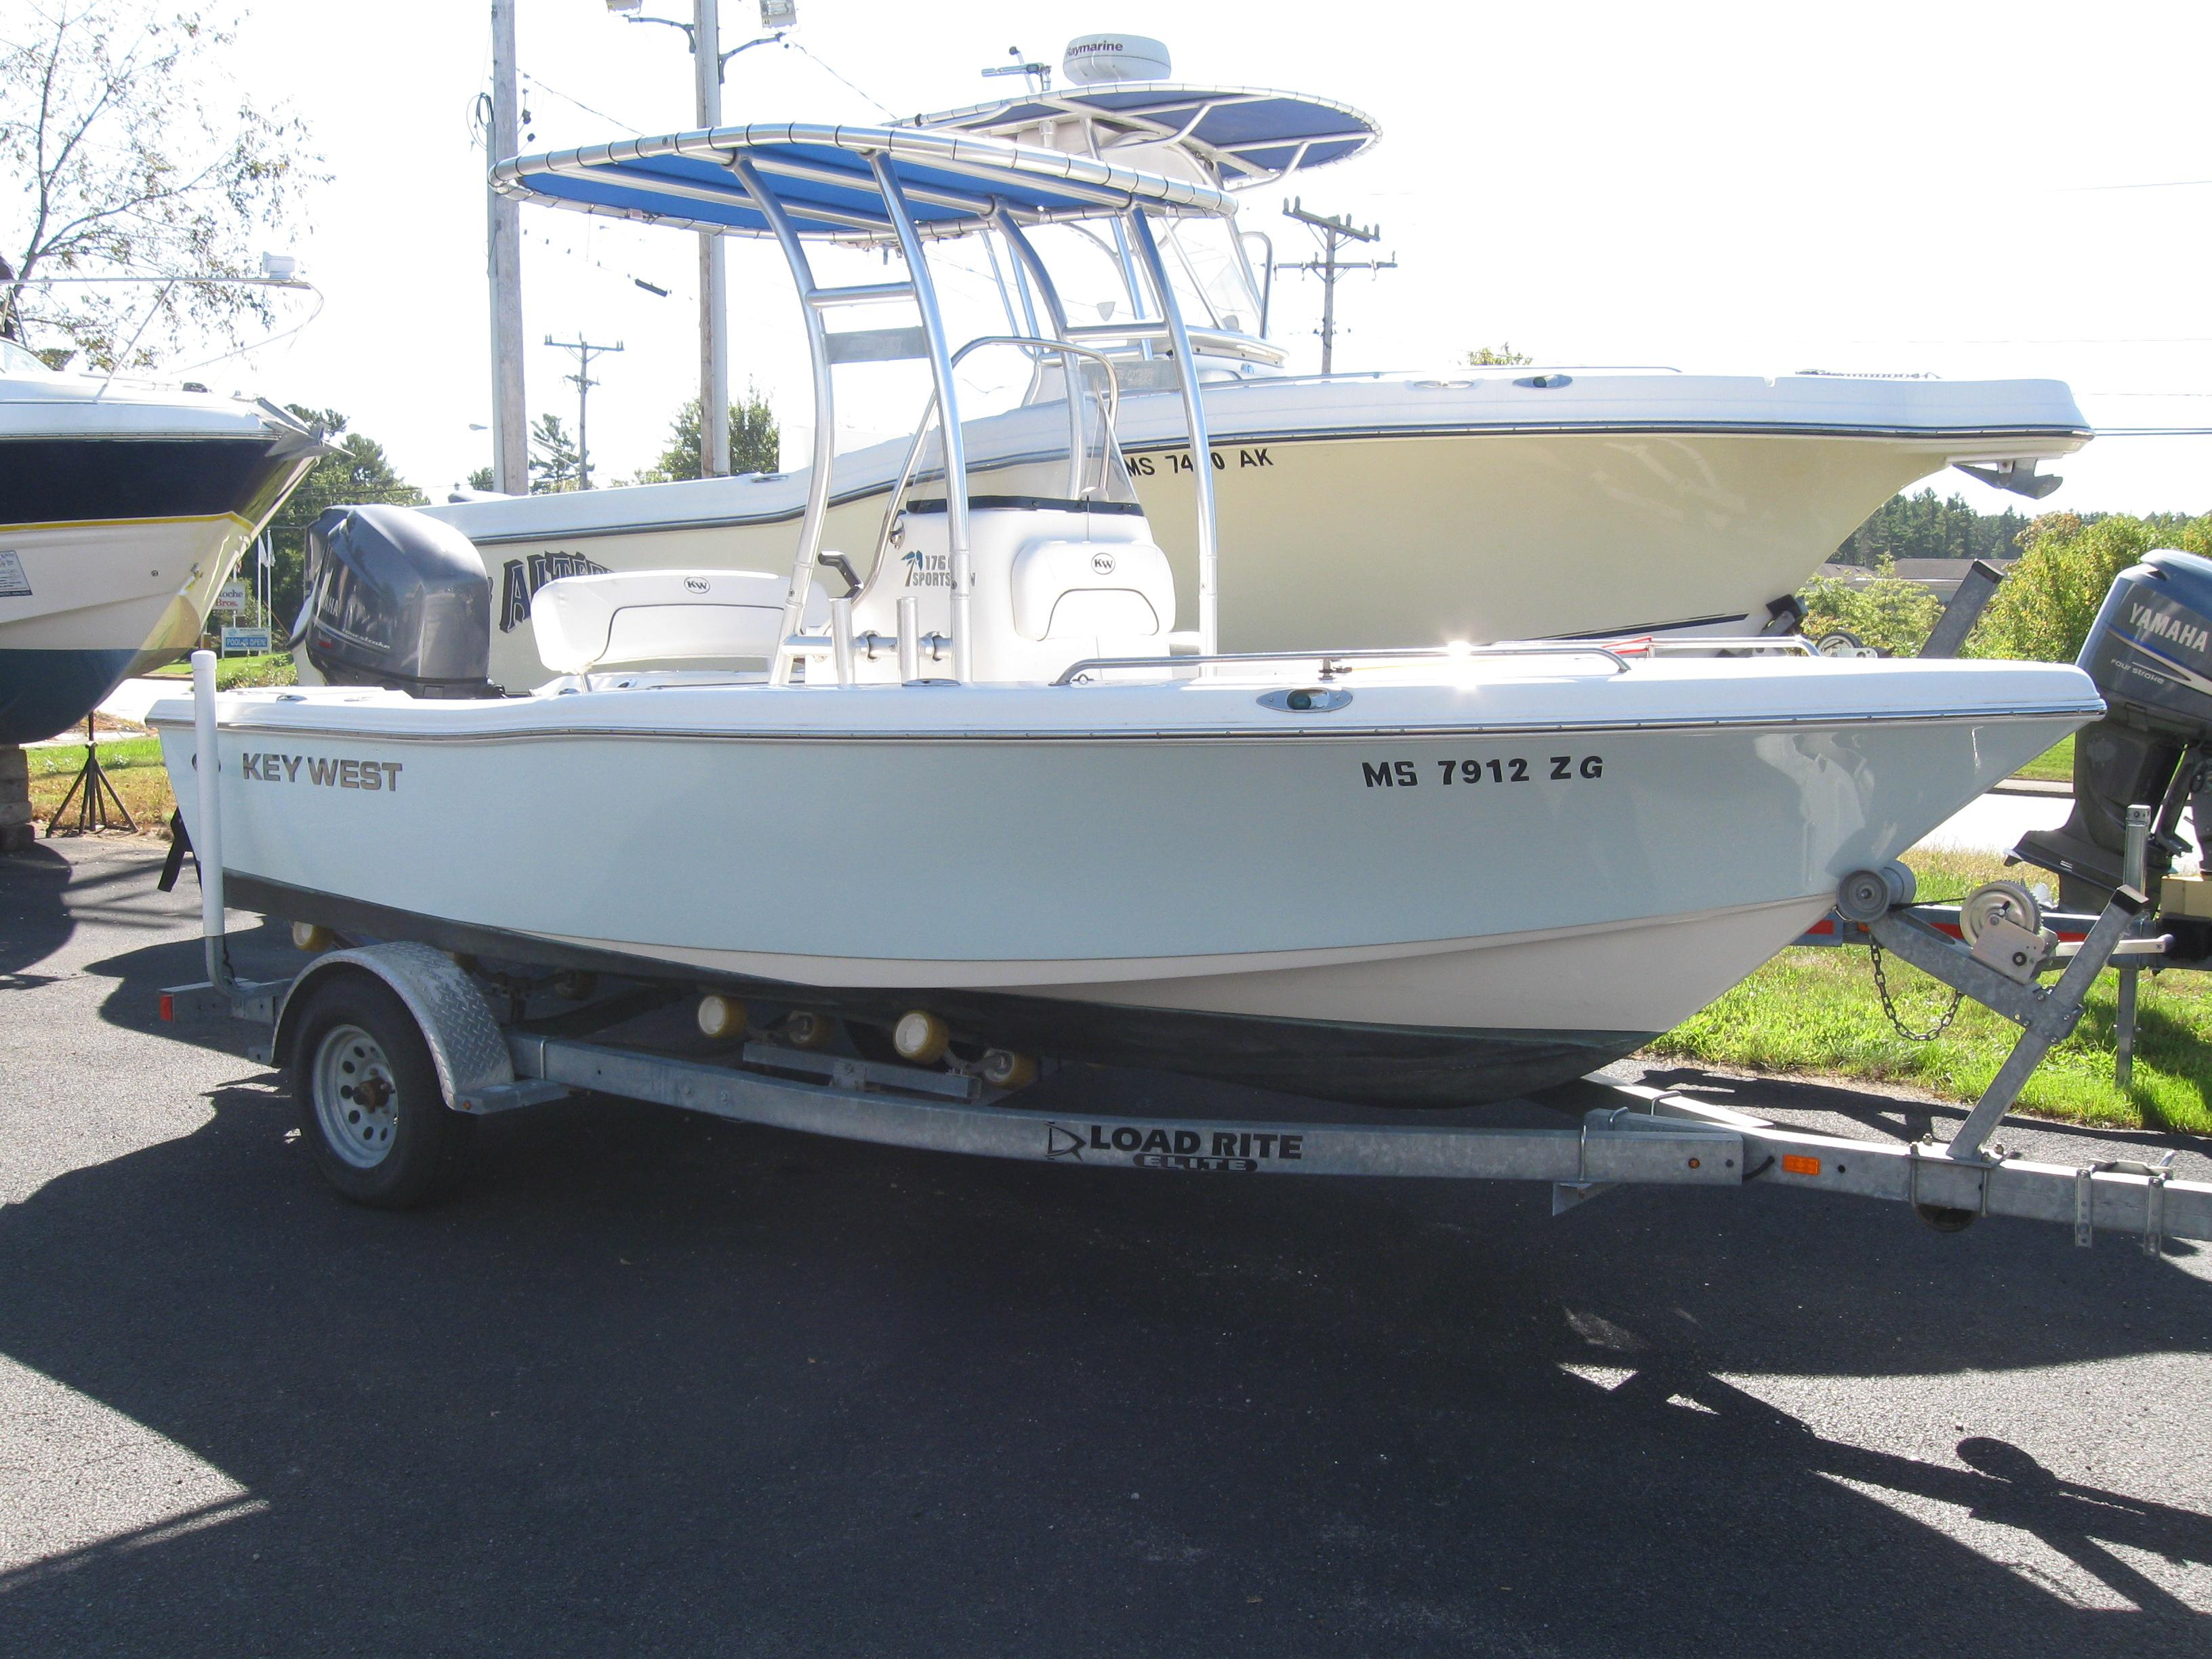 Xpress Boat Wiring Diagram - Lir Wiring 101 on javelin boat interior, javelin boat accessories, javelin boat parts, javelin boat seats, javelin boat lights, javelin boat motors, javelin boat dash,